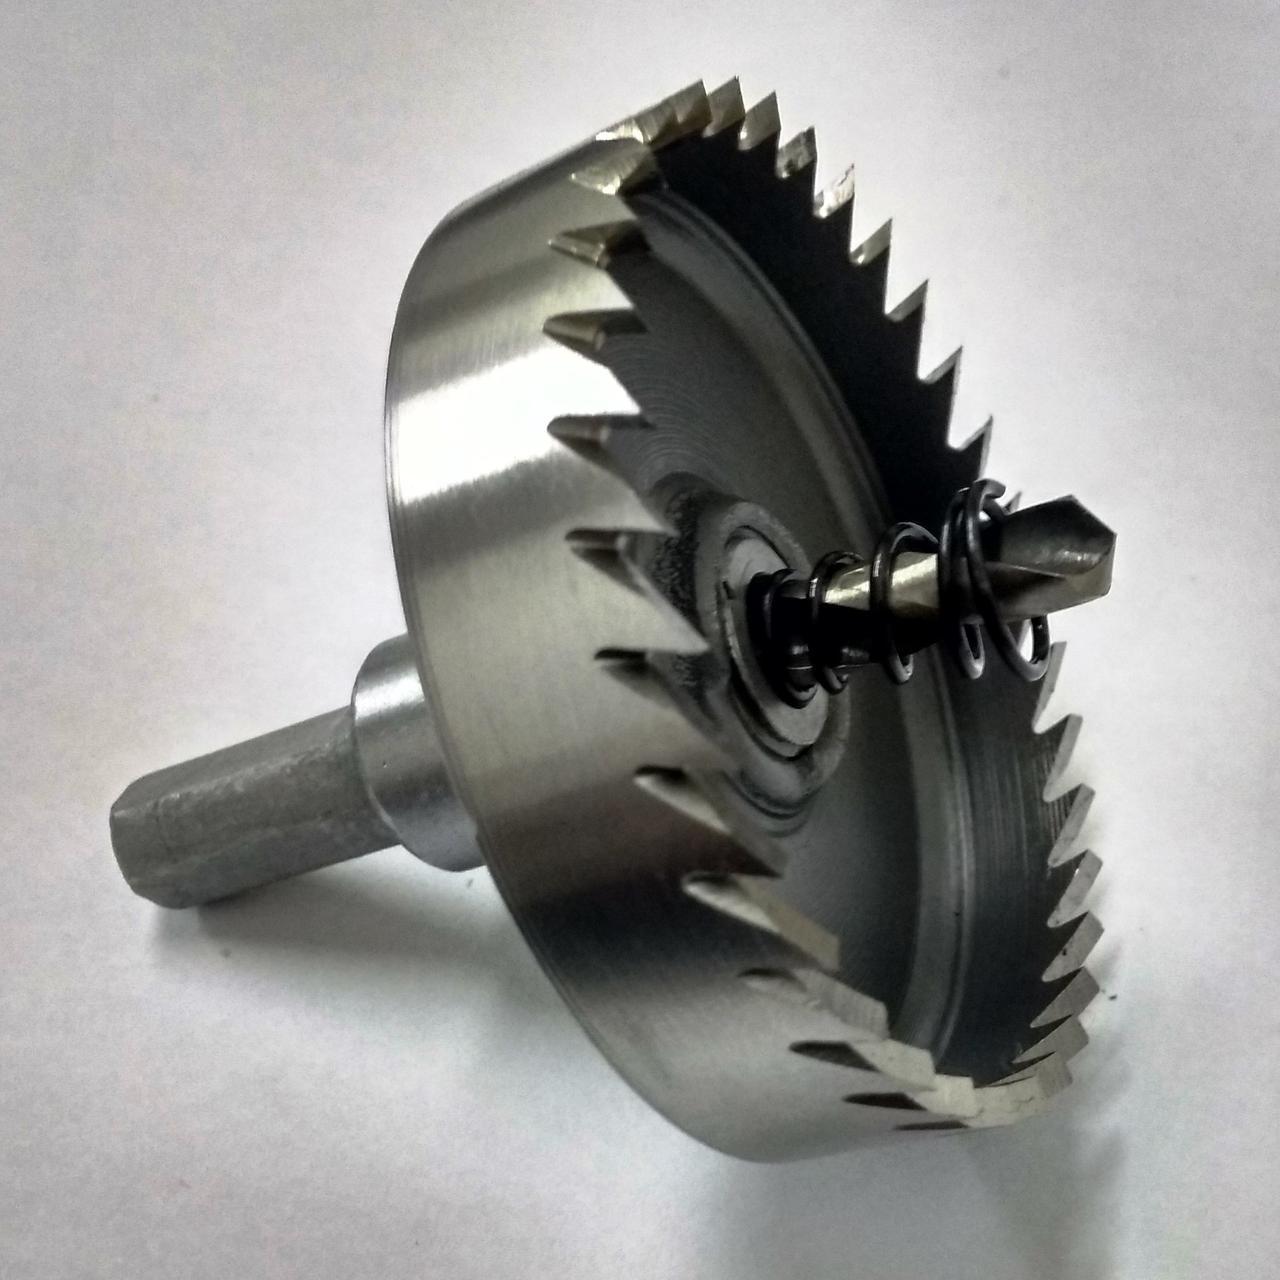 Коронка по металлу (Фреза корончатая) ф.22мм Р6М5